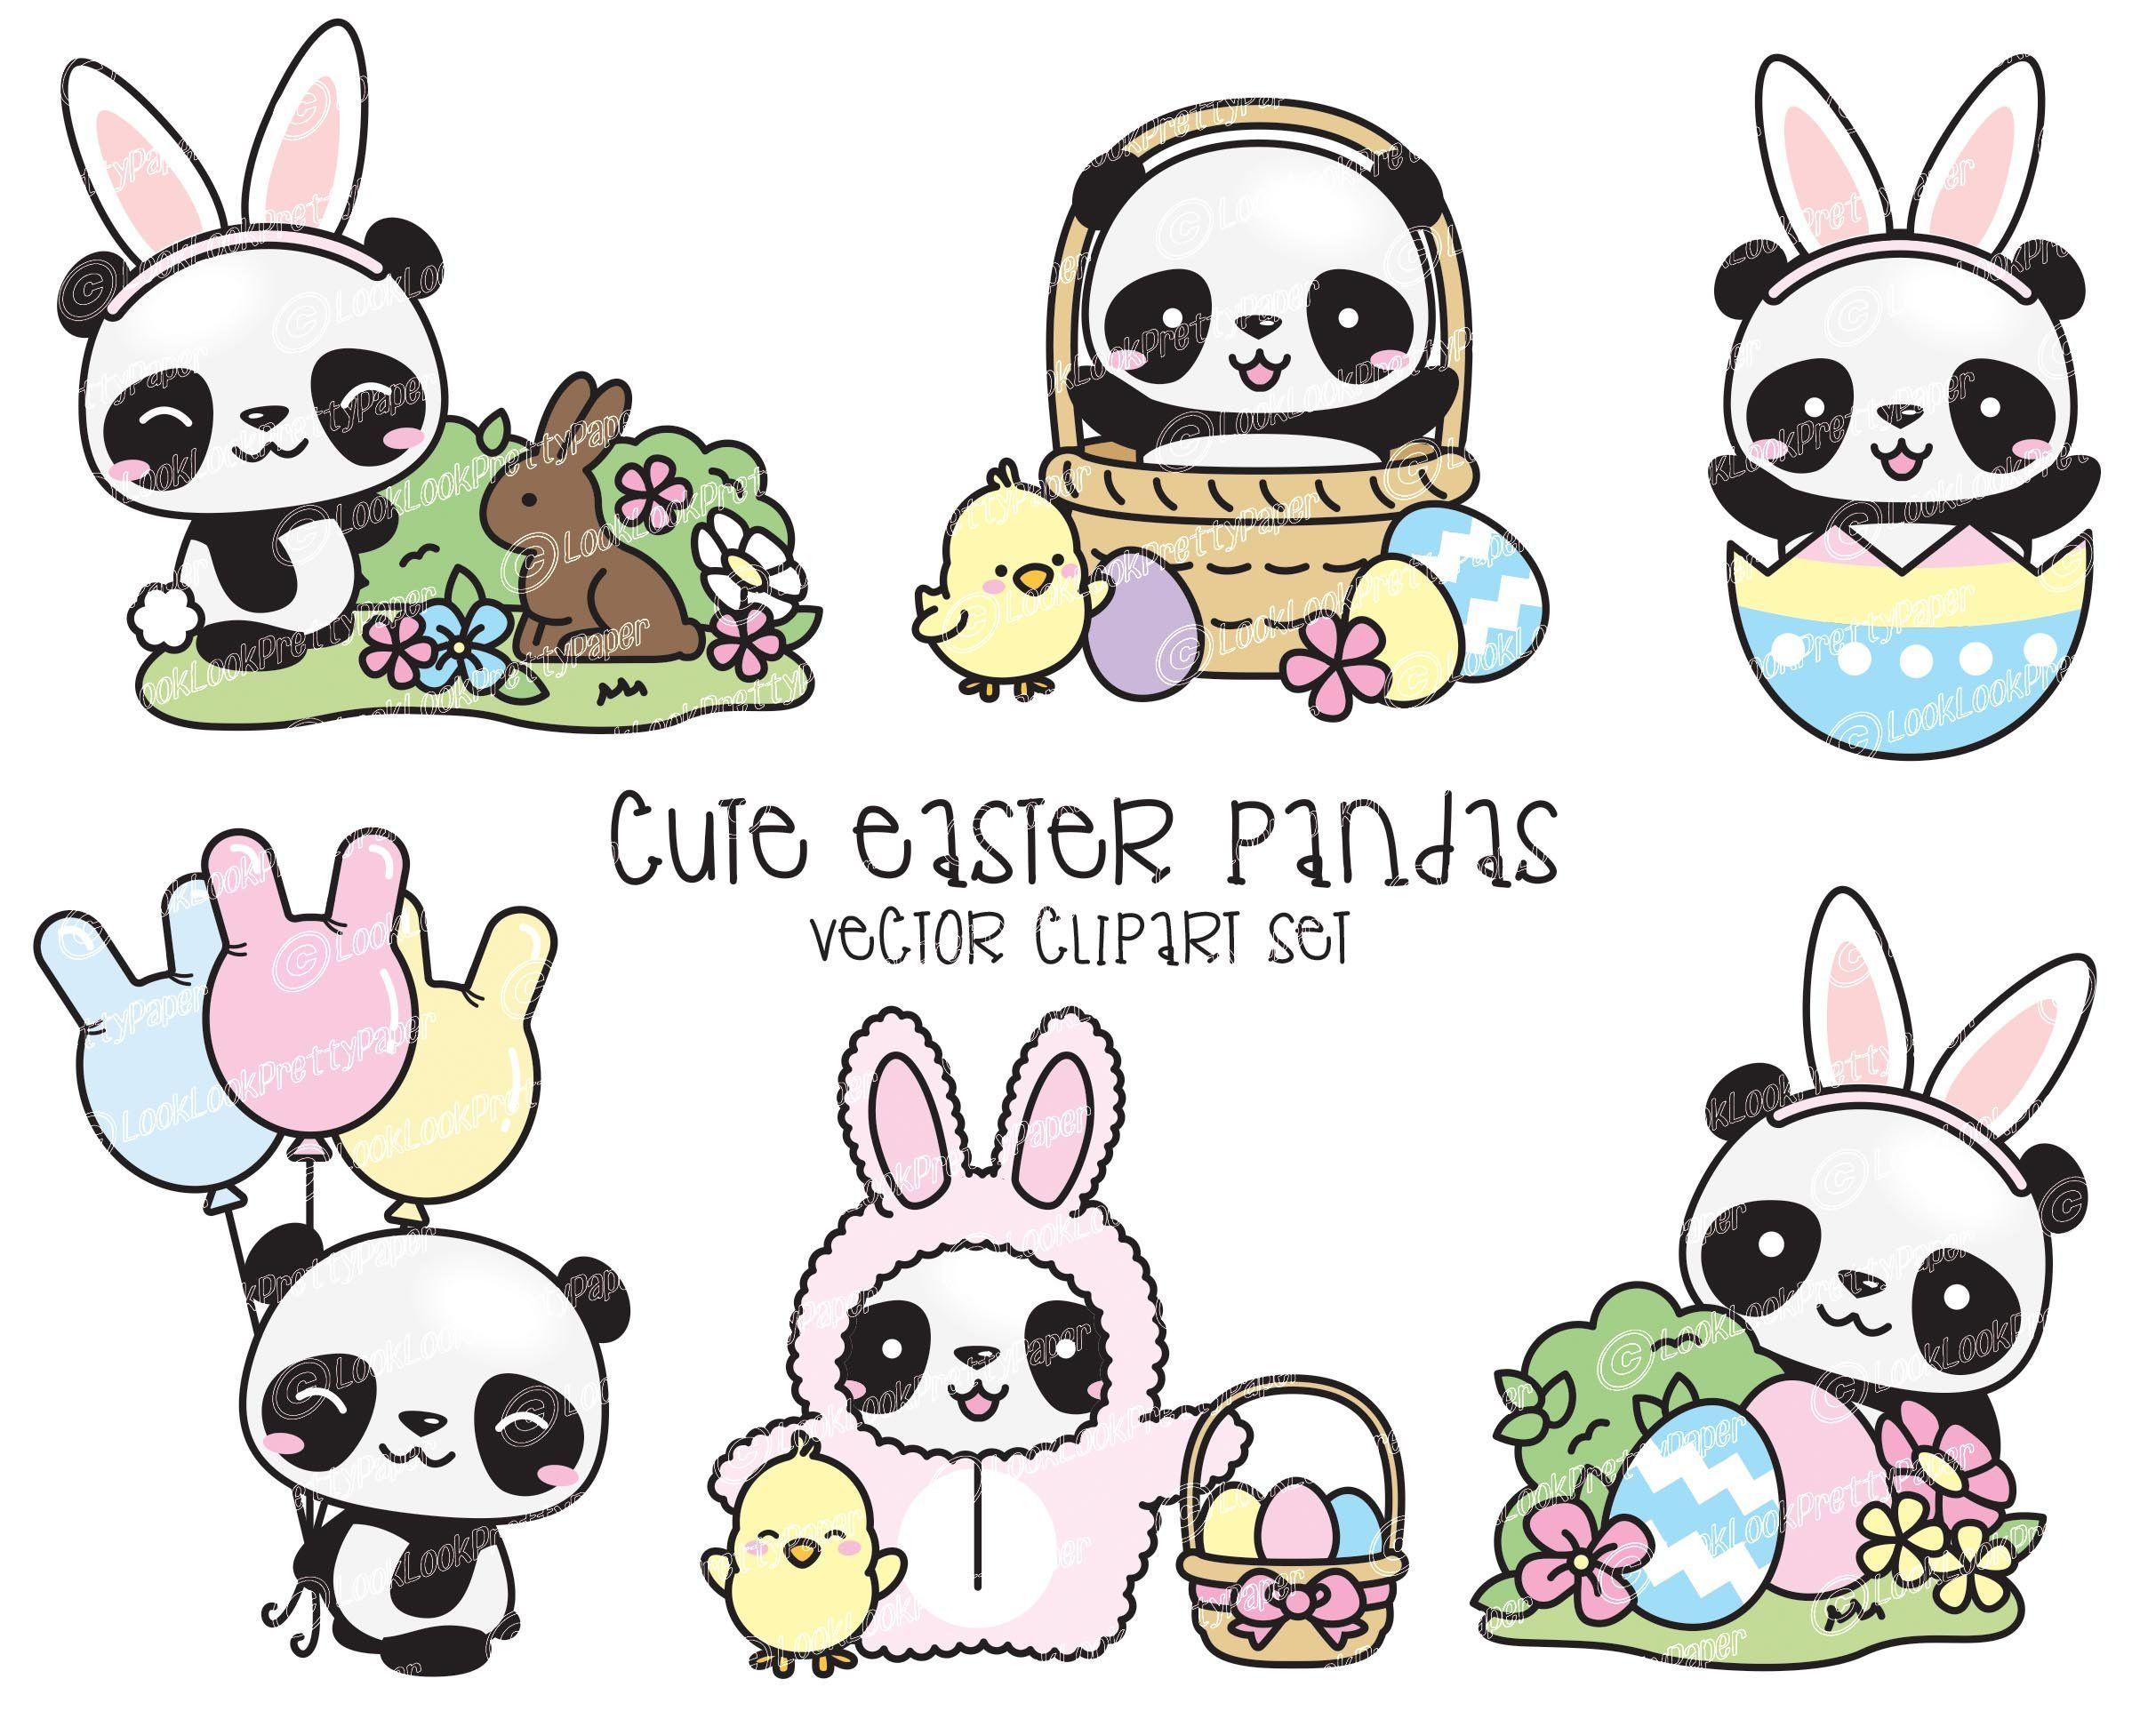 Premium Vector Clipart Kawaii Easter Pandas Cute Easter Panda